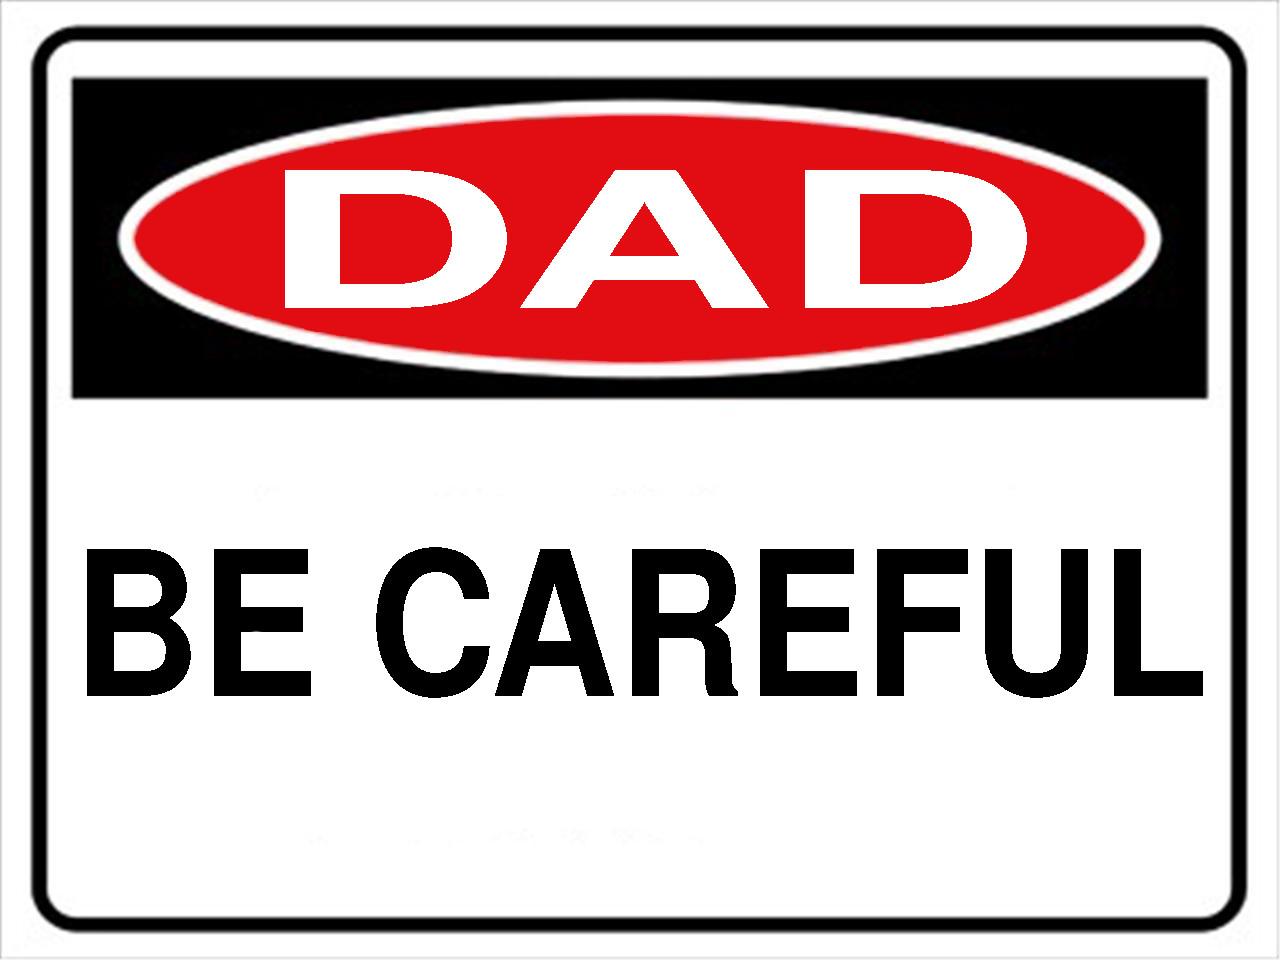 Dad be careful hardhat sticker